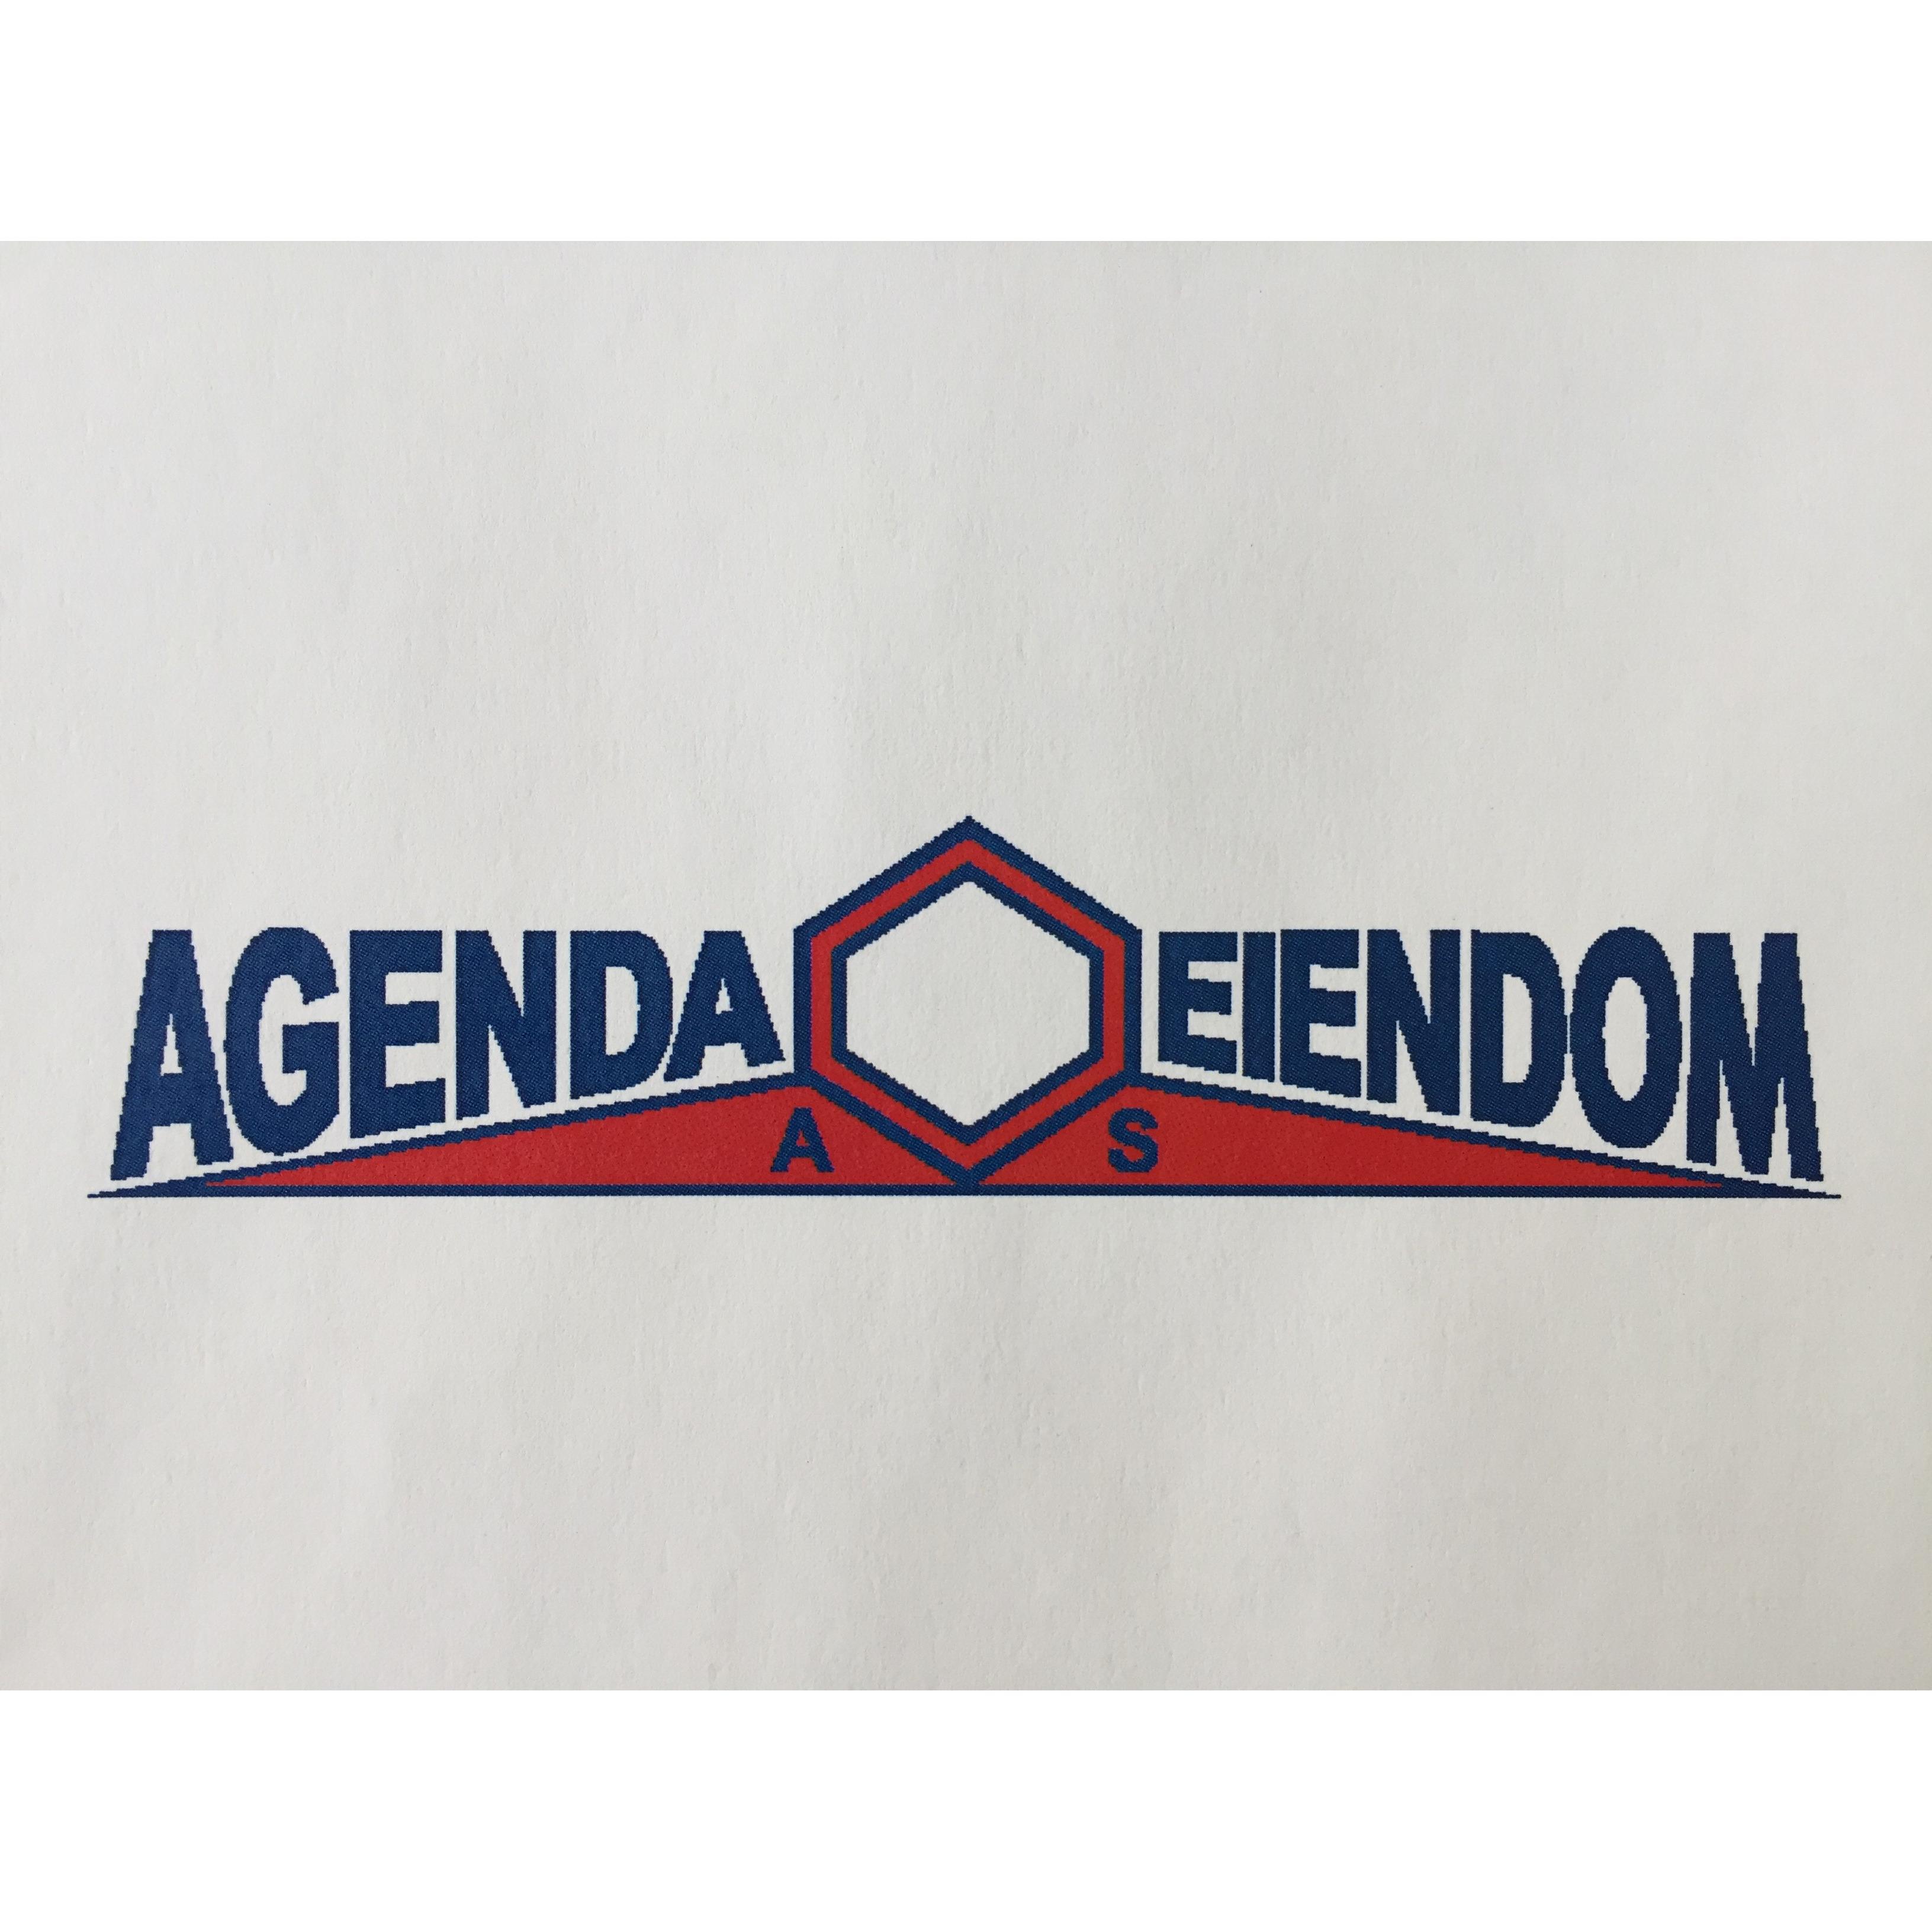 Agenda Eiendom AS